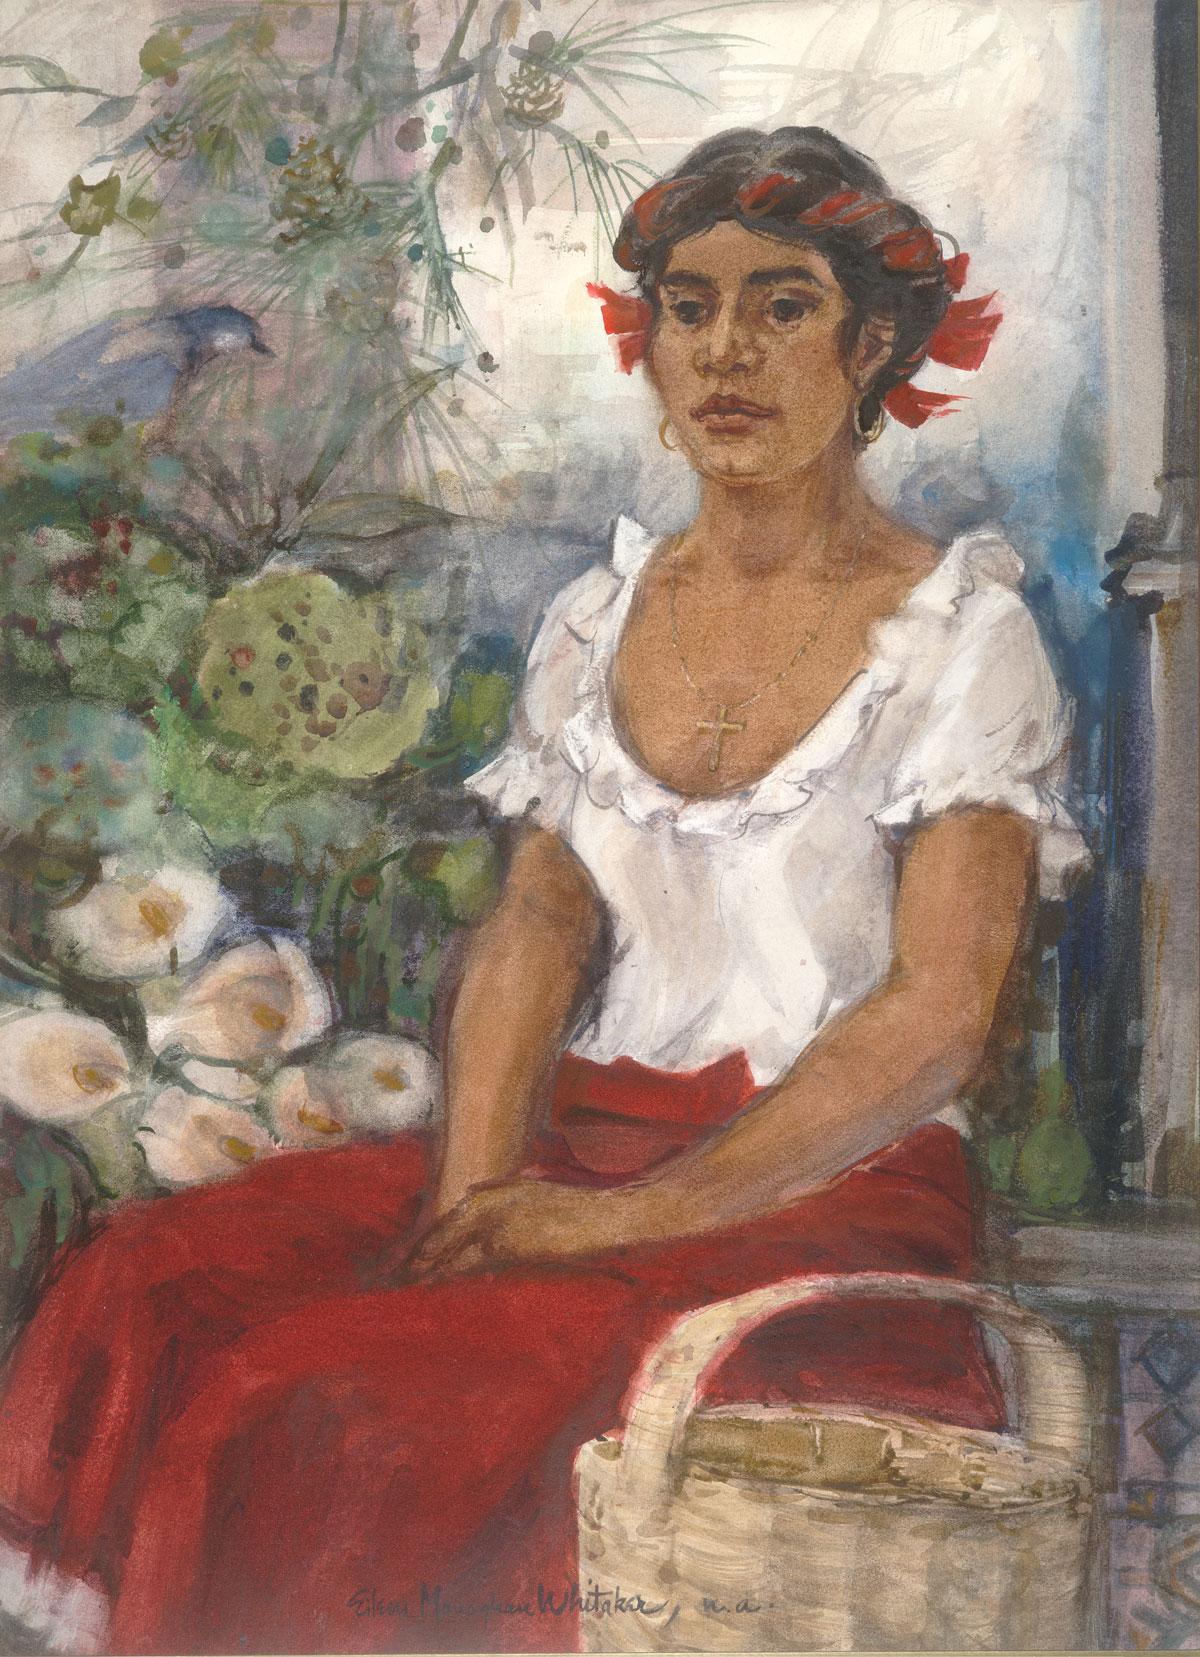 """Zapoteca Girl"" 1975 © Eileen Monaghan Whitaker N.A. 30x22 inches Watercolor"